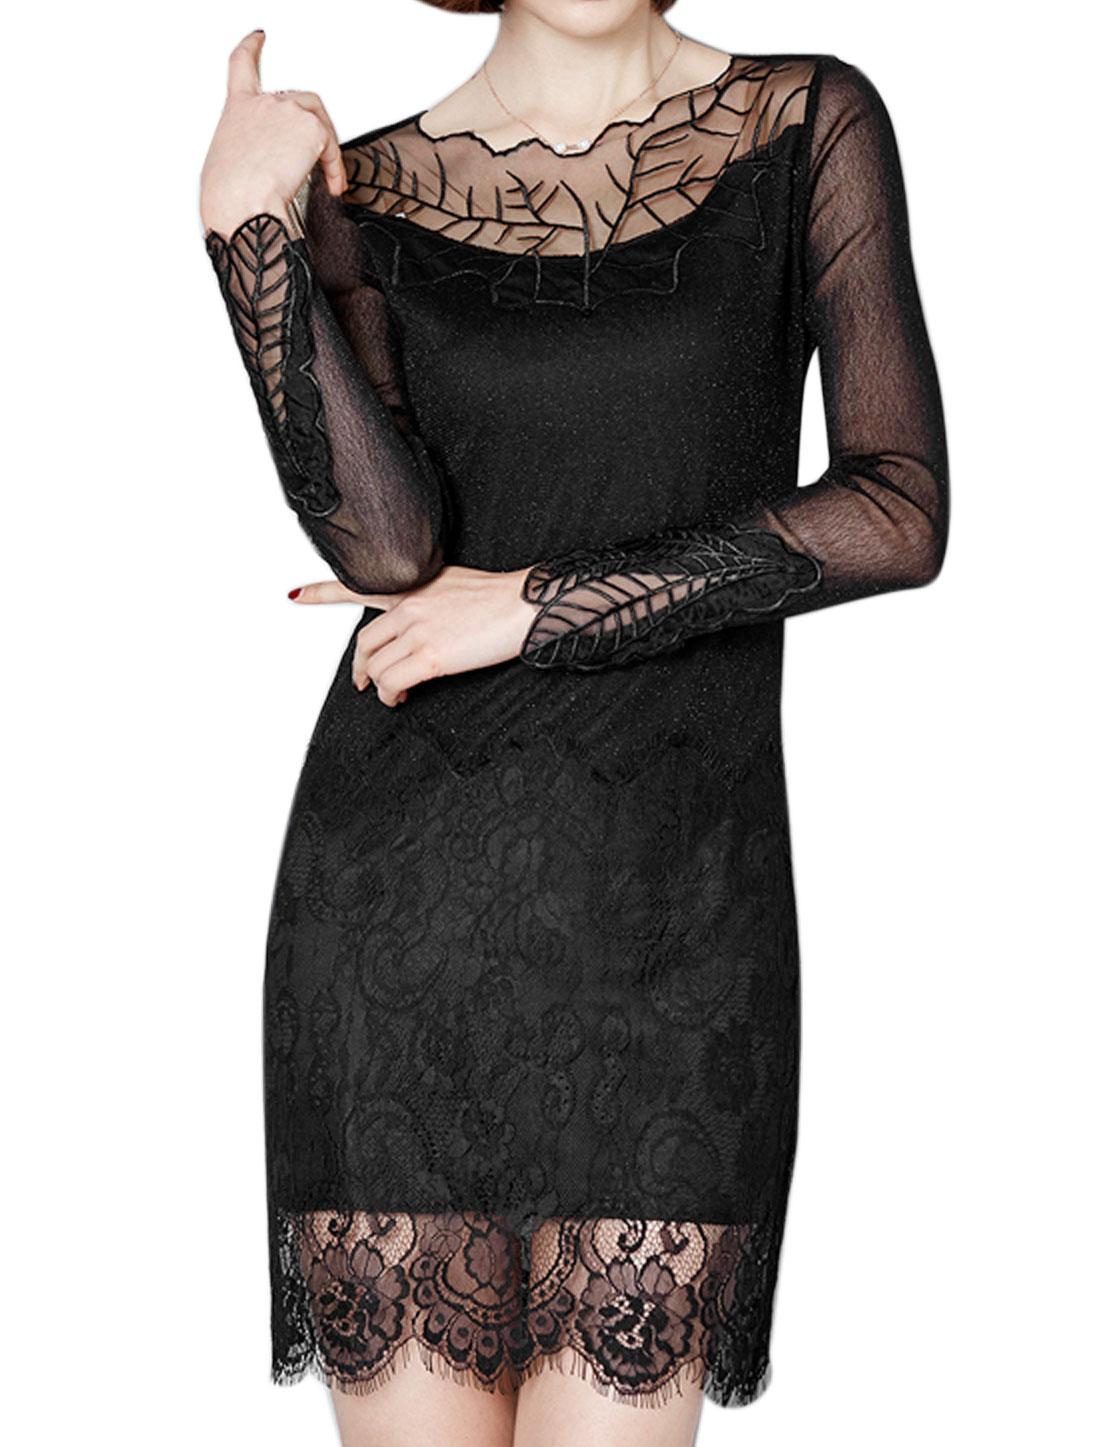 Women Leaf Embroidered Mesh Floral Lace Panel Sheath Dress Black M